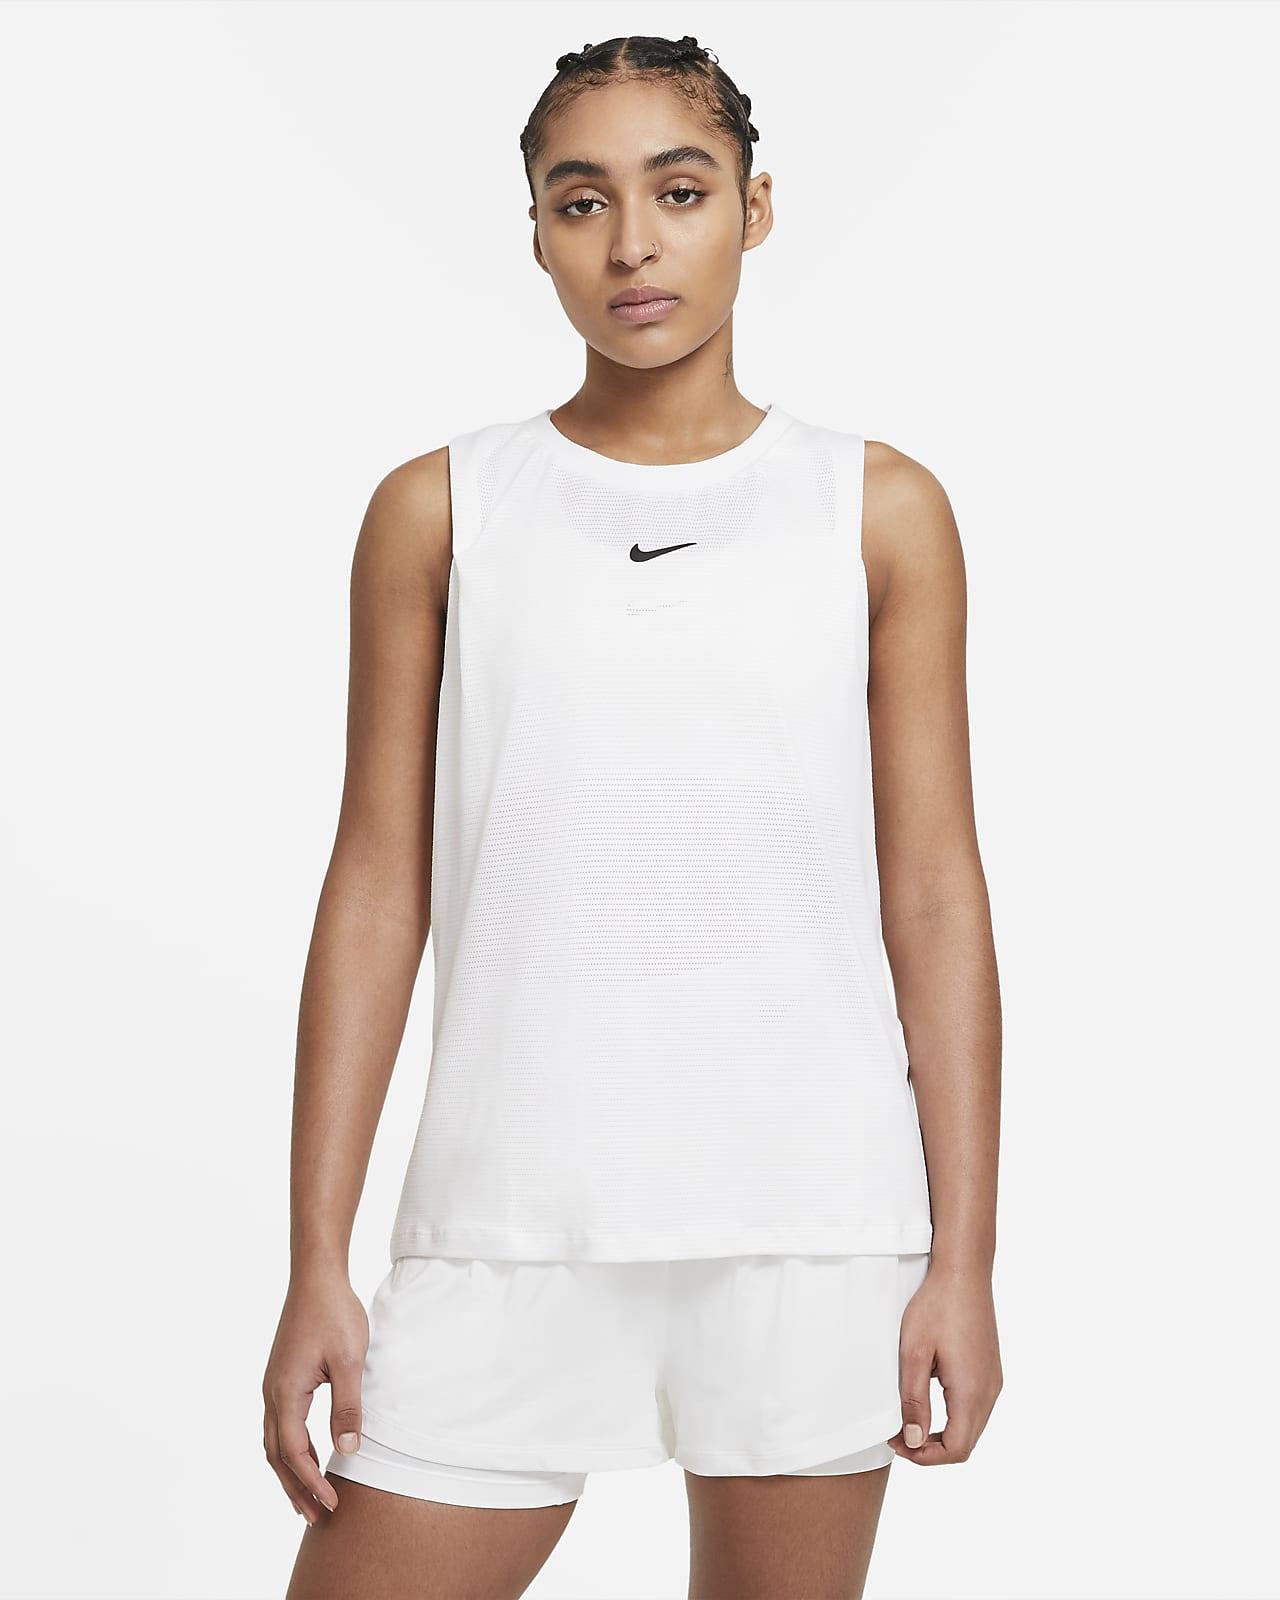 Canotta da tennis NikeCourt Advantage - Donna